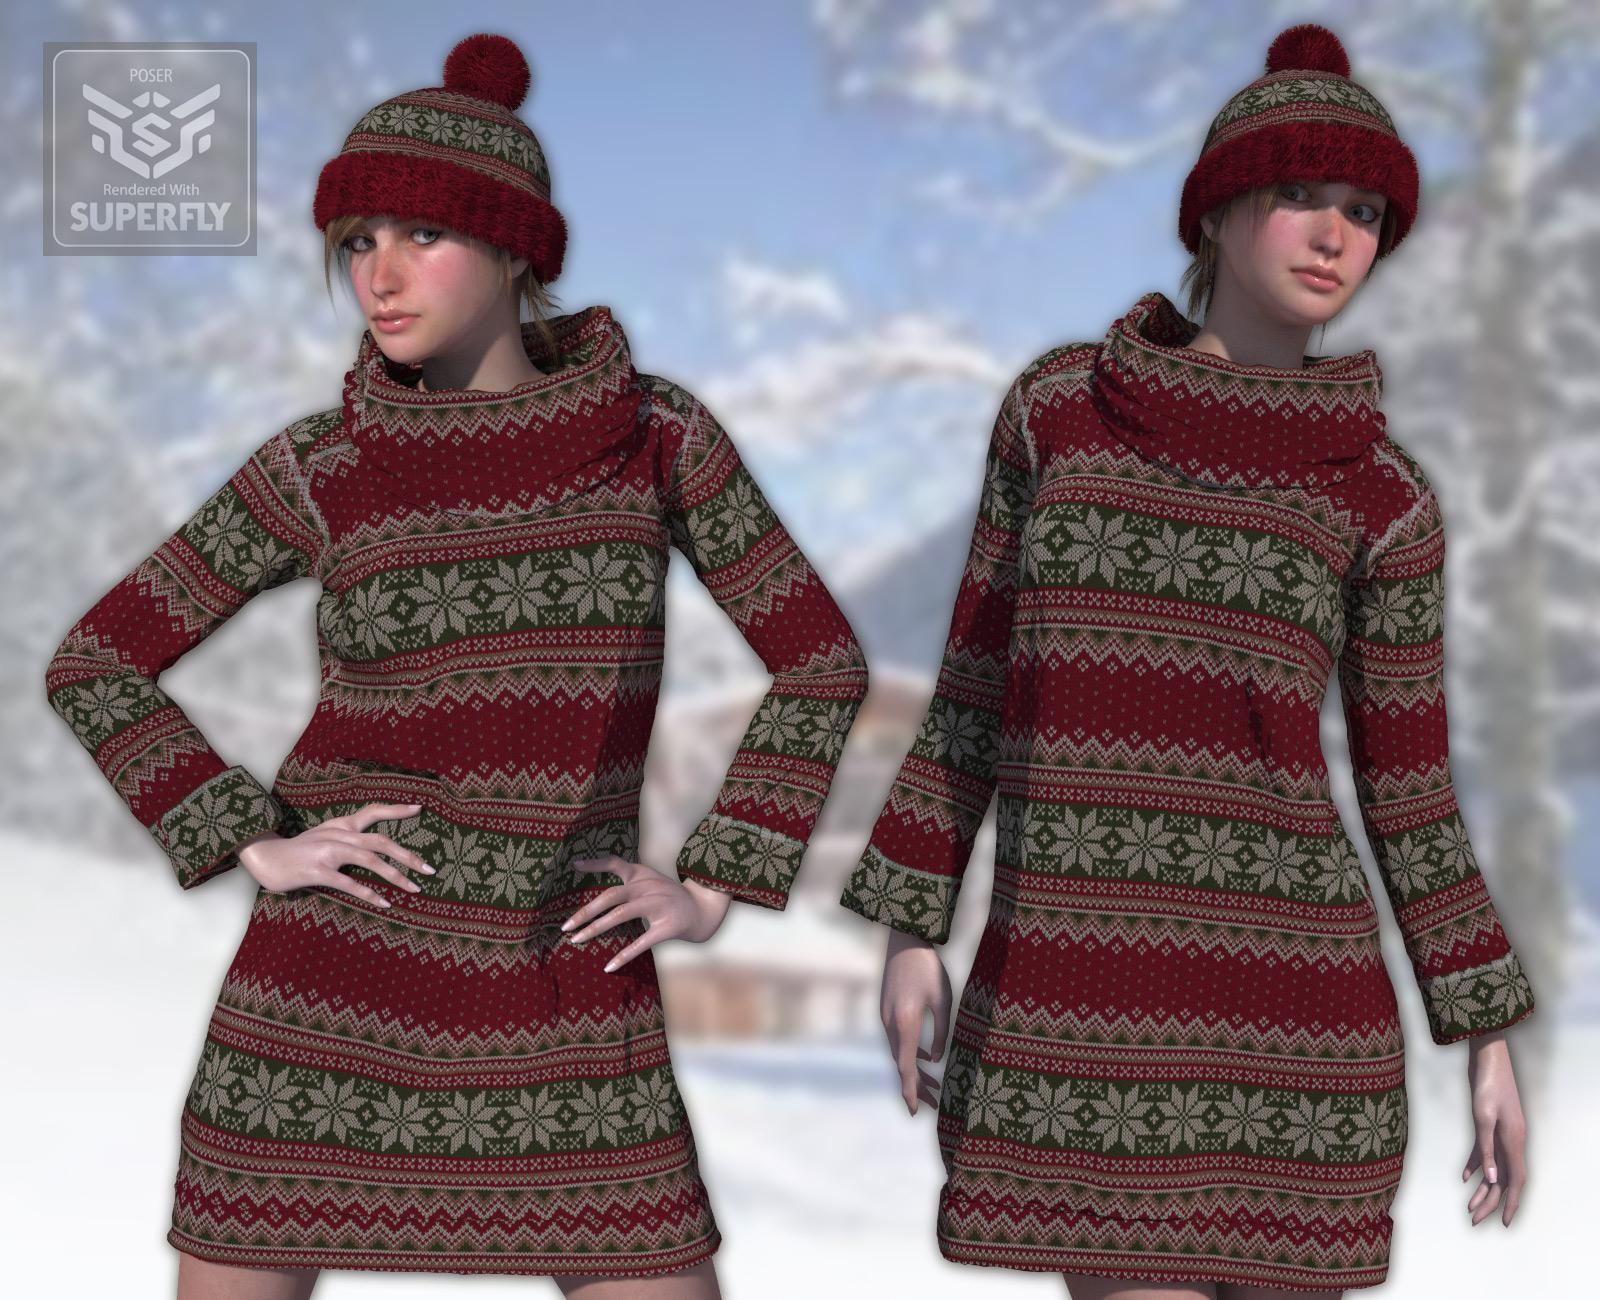 Wintercap promo 2